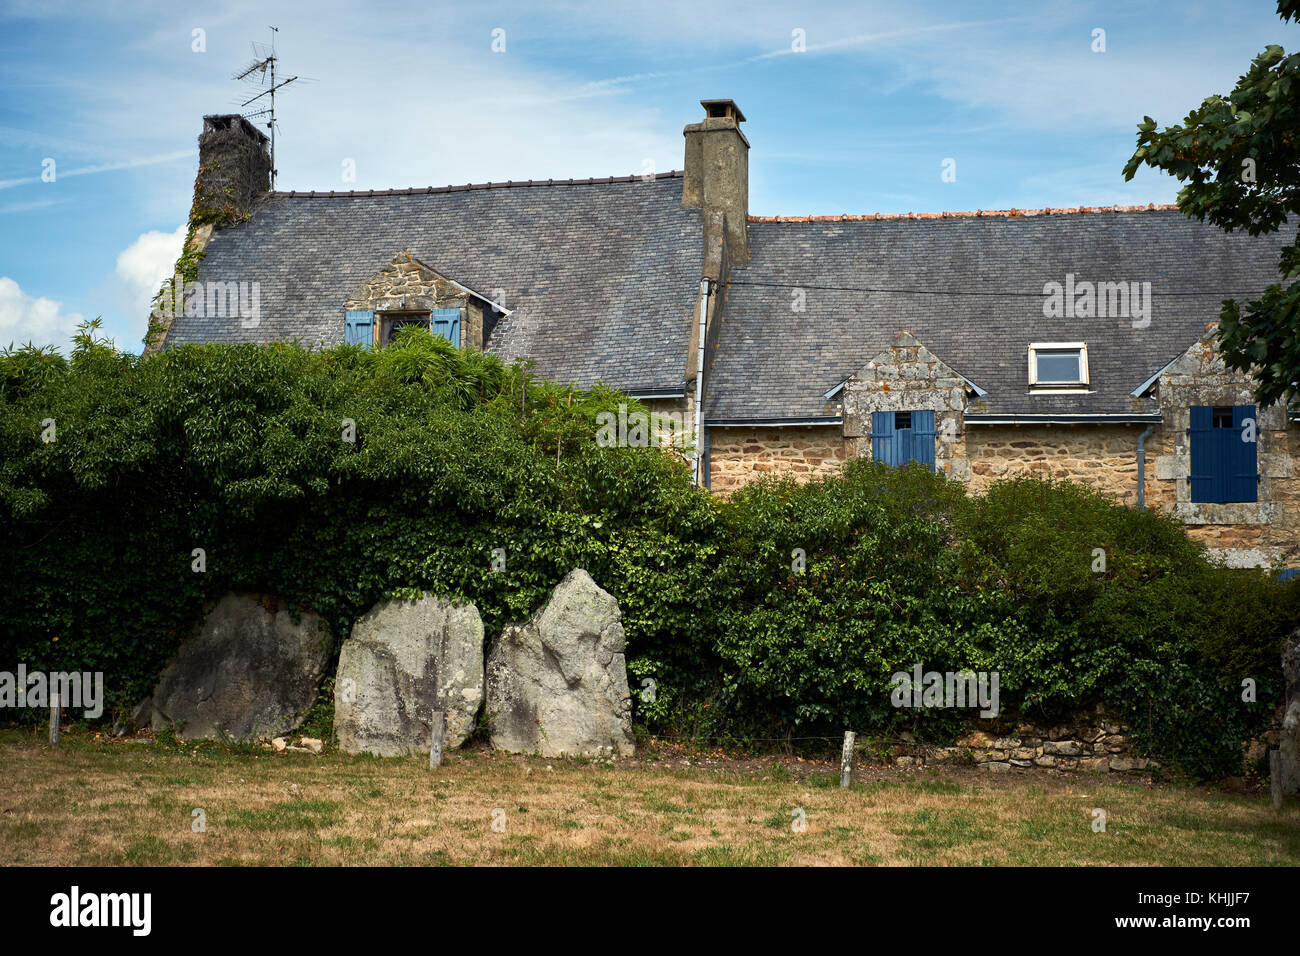 Standing Stones auf der Ile aux Moines in den Golfe du Morbihan Bretagne Frankreich. Stockbild